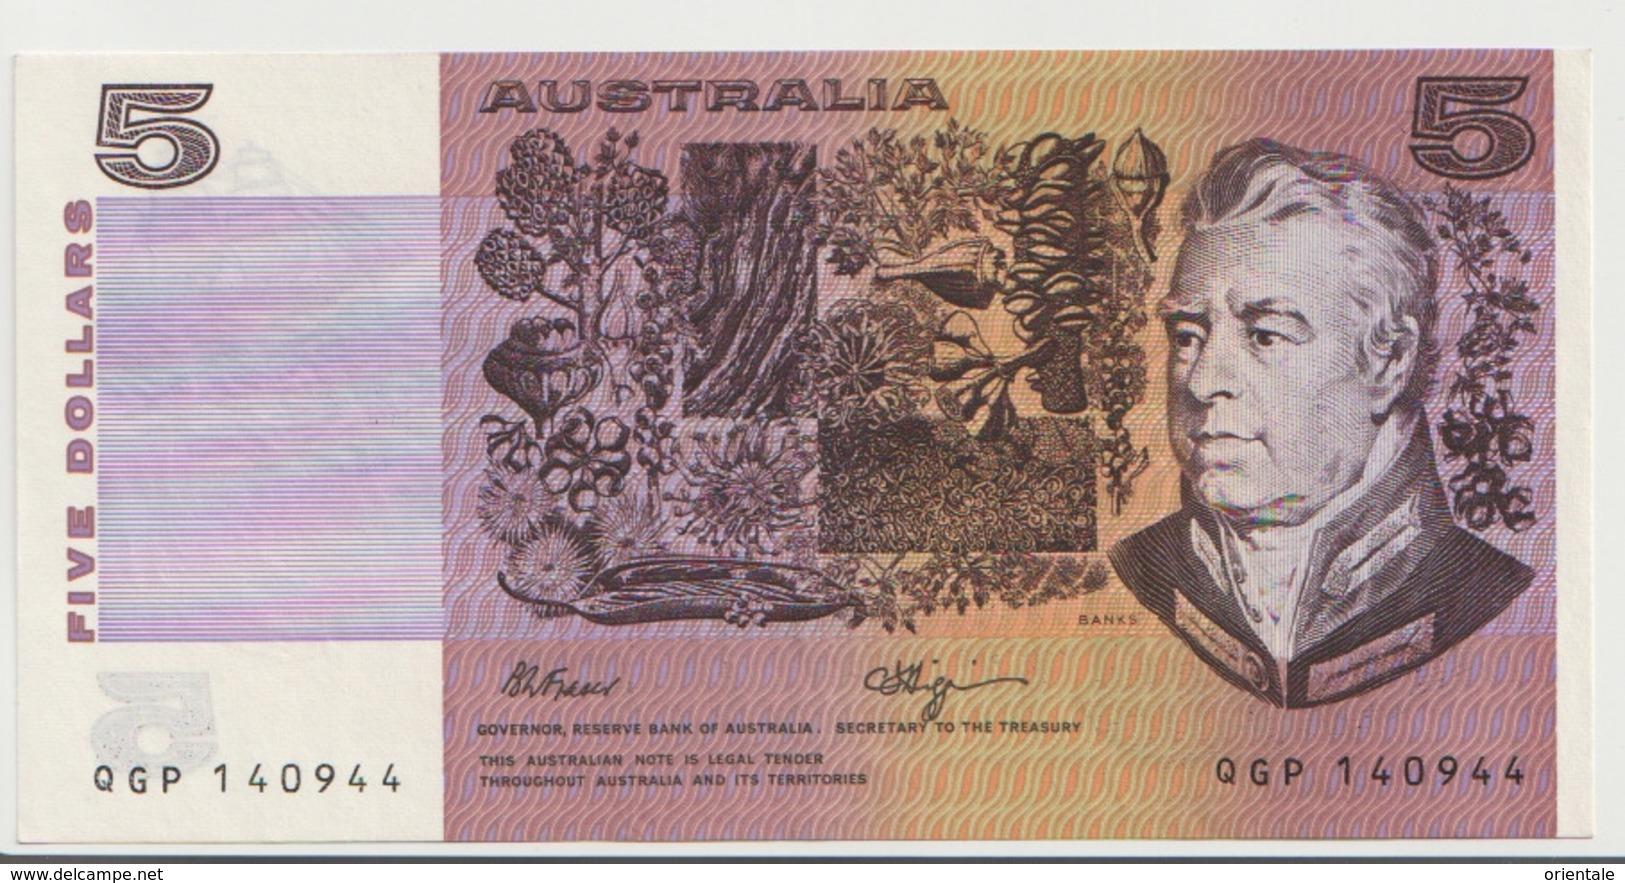 AUSTRALIA P. 44f 5 D 1980 AUNC - 1974-94 Australia Reserve Bank